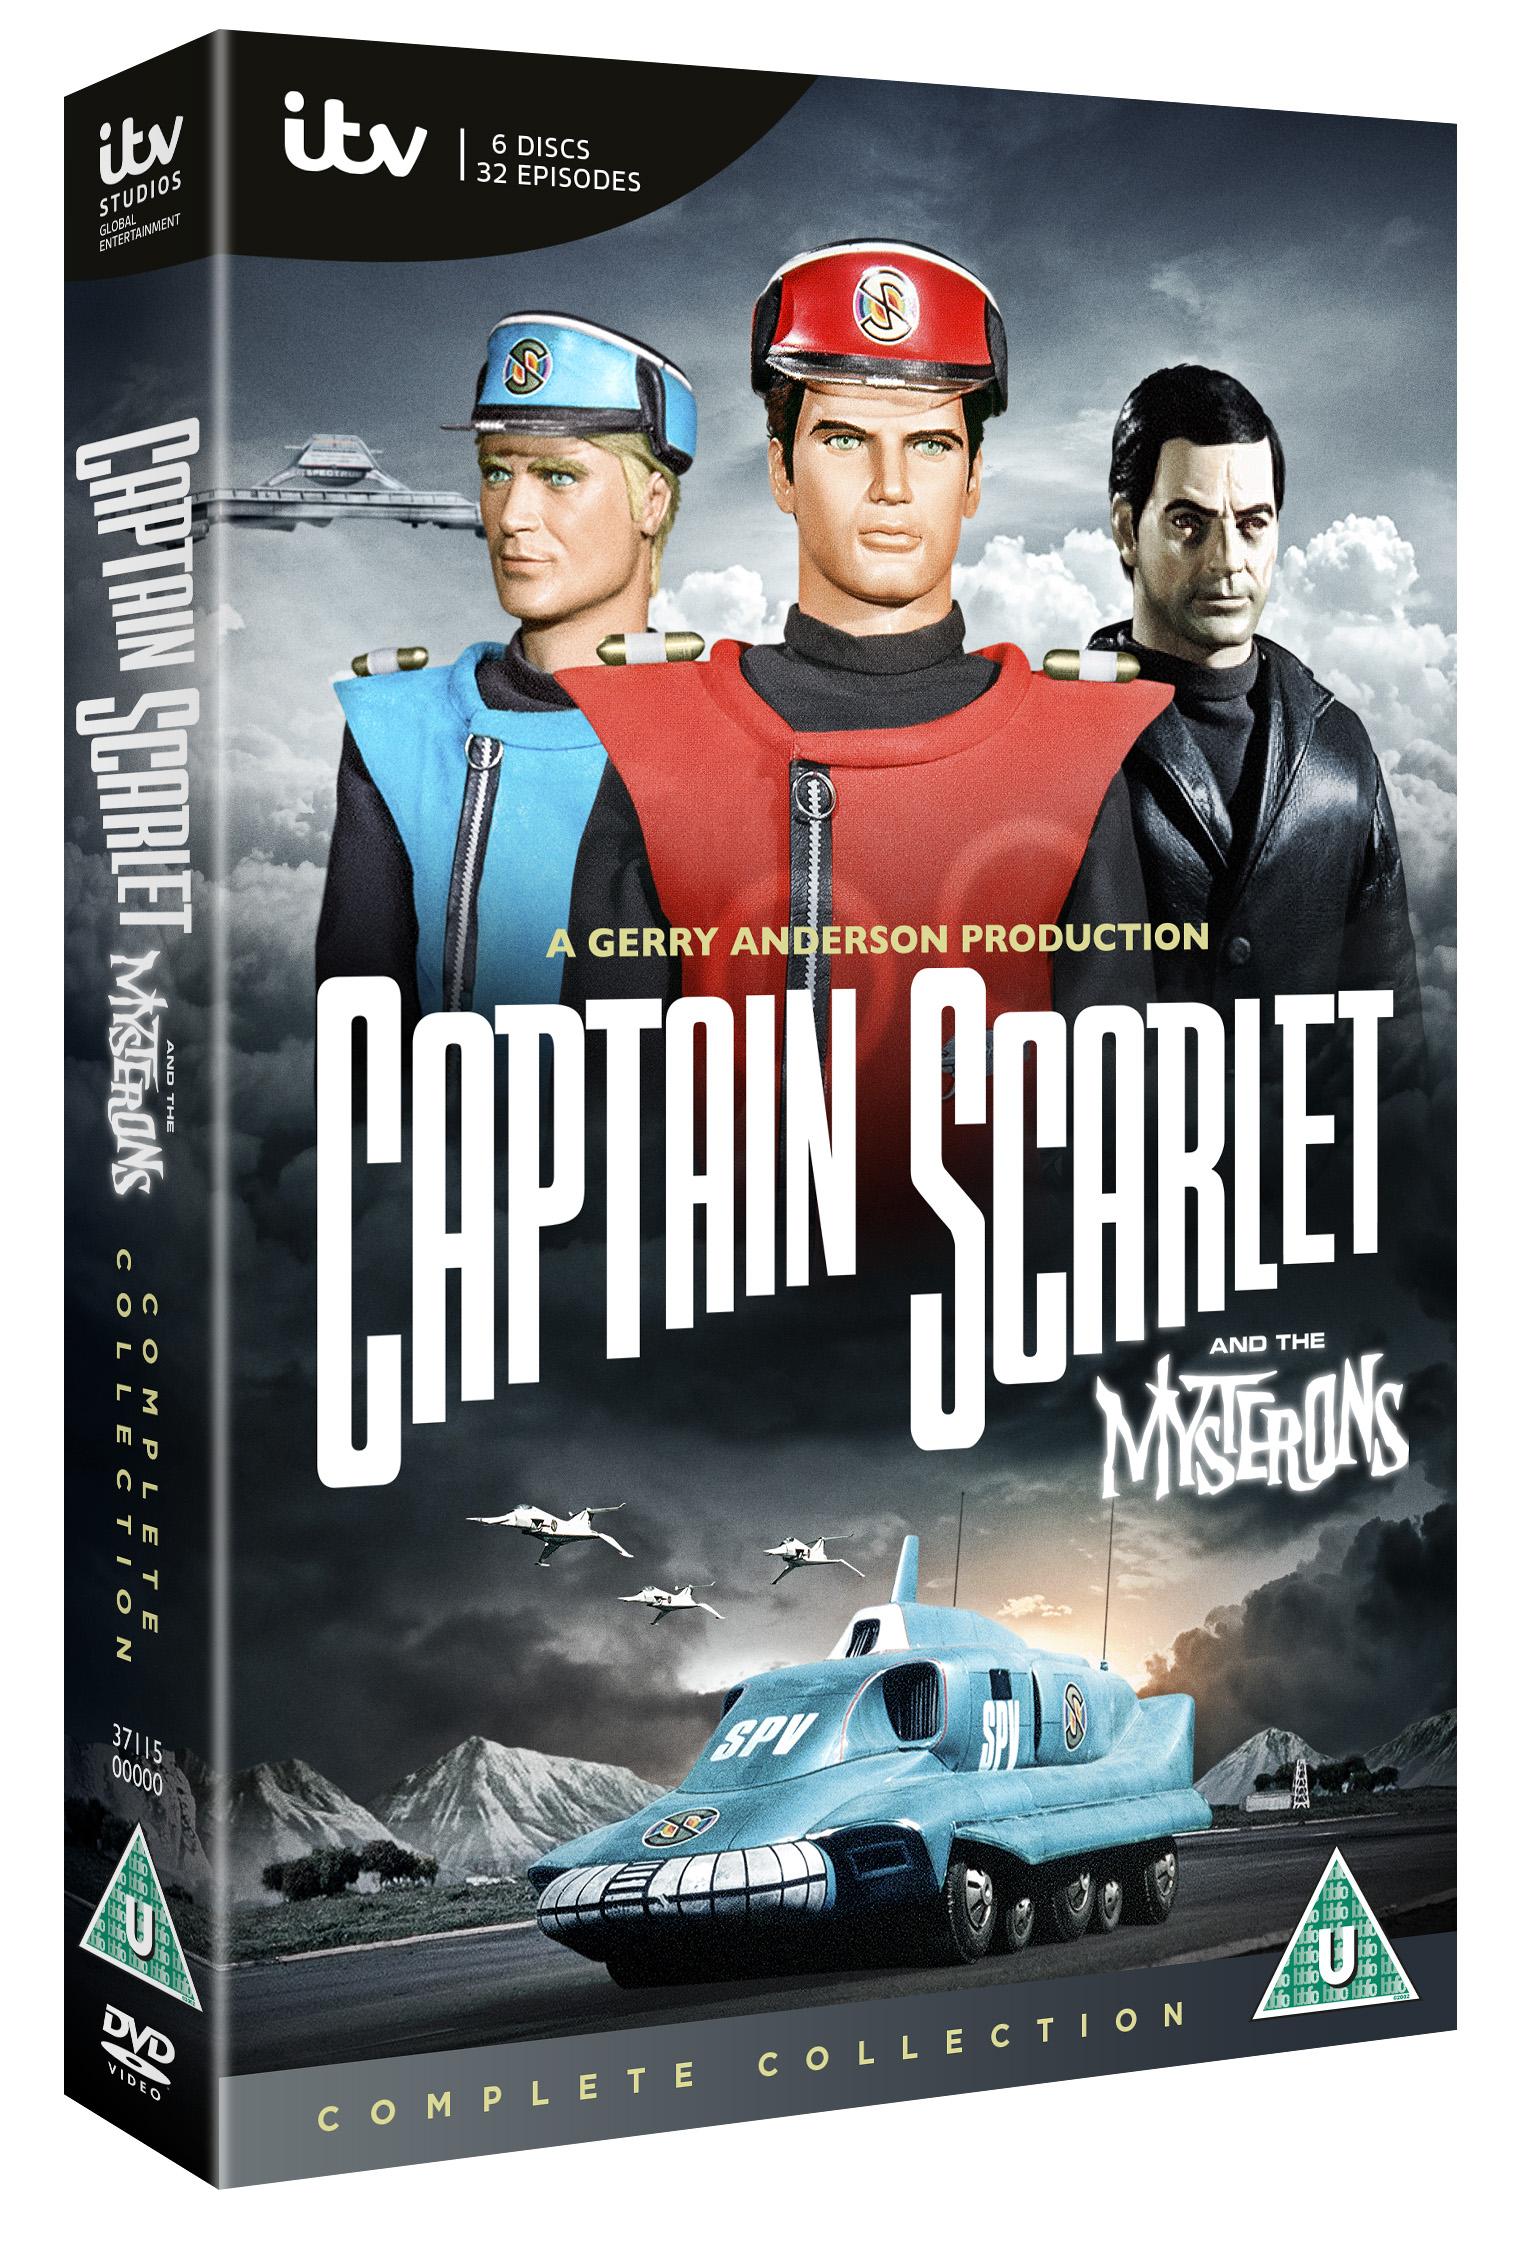 Captain Scarlet DVD 3D